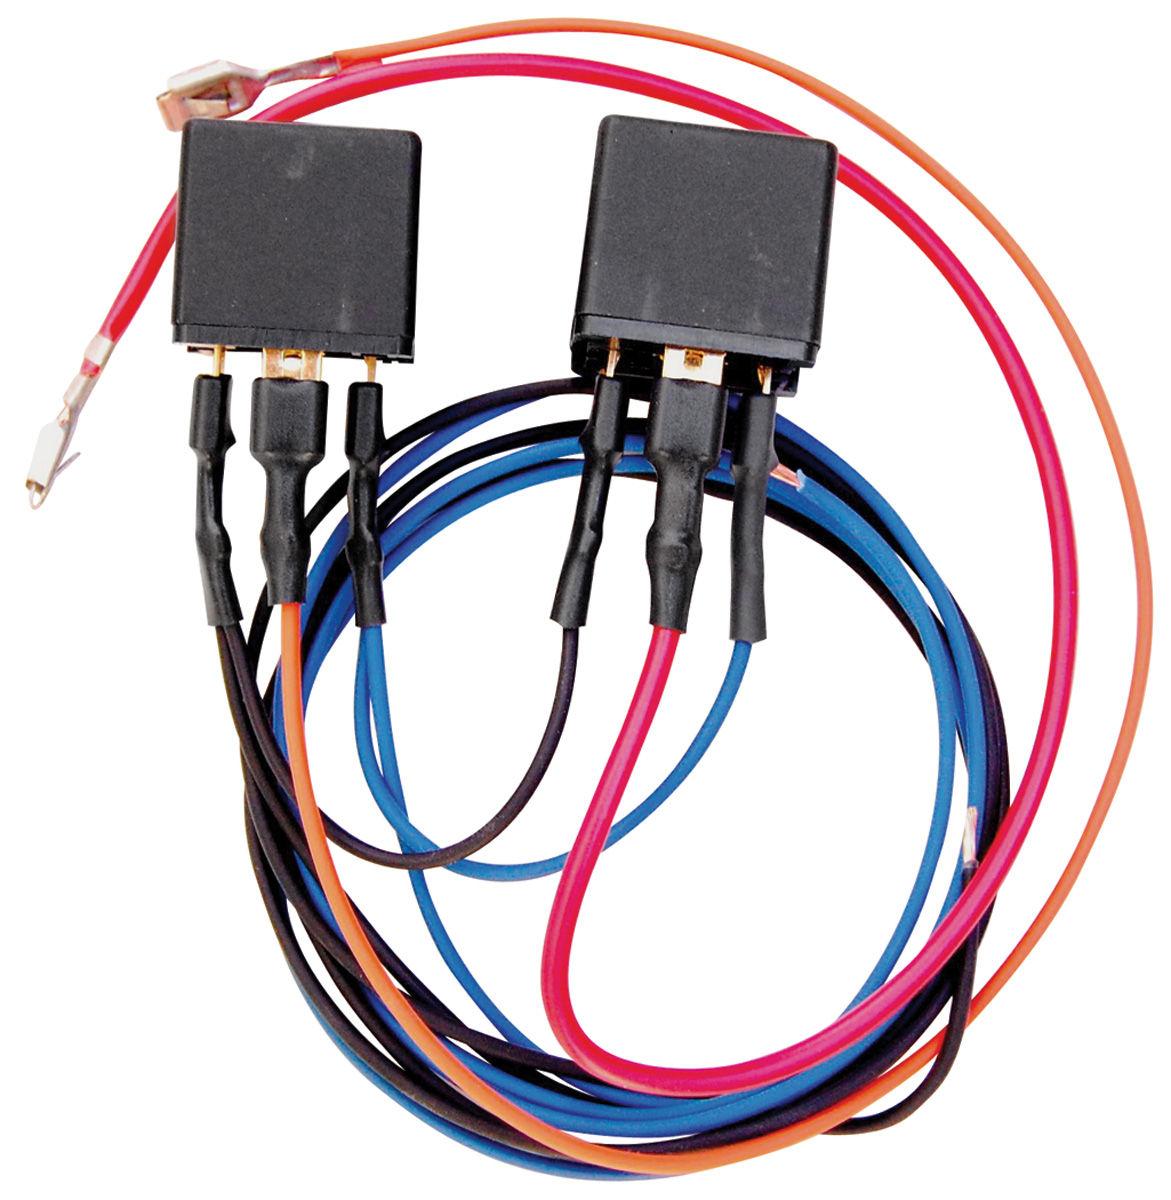 Enjoyable Revolution Electronics Headlight Auto Off Relay Kit Fits 1964 77 Wiring 101 Olytiaxxcnl